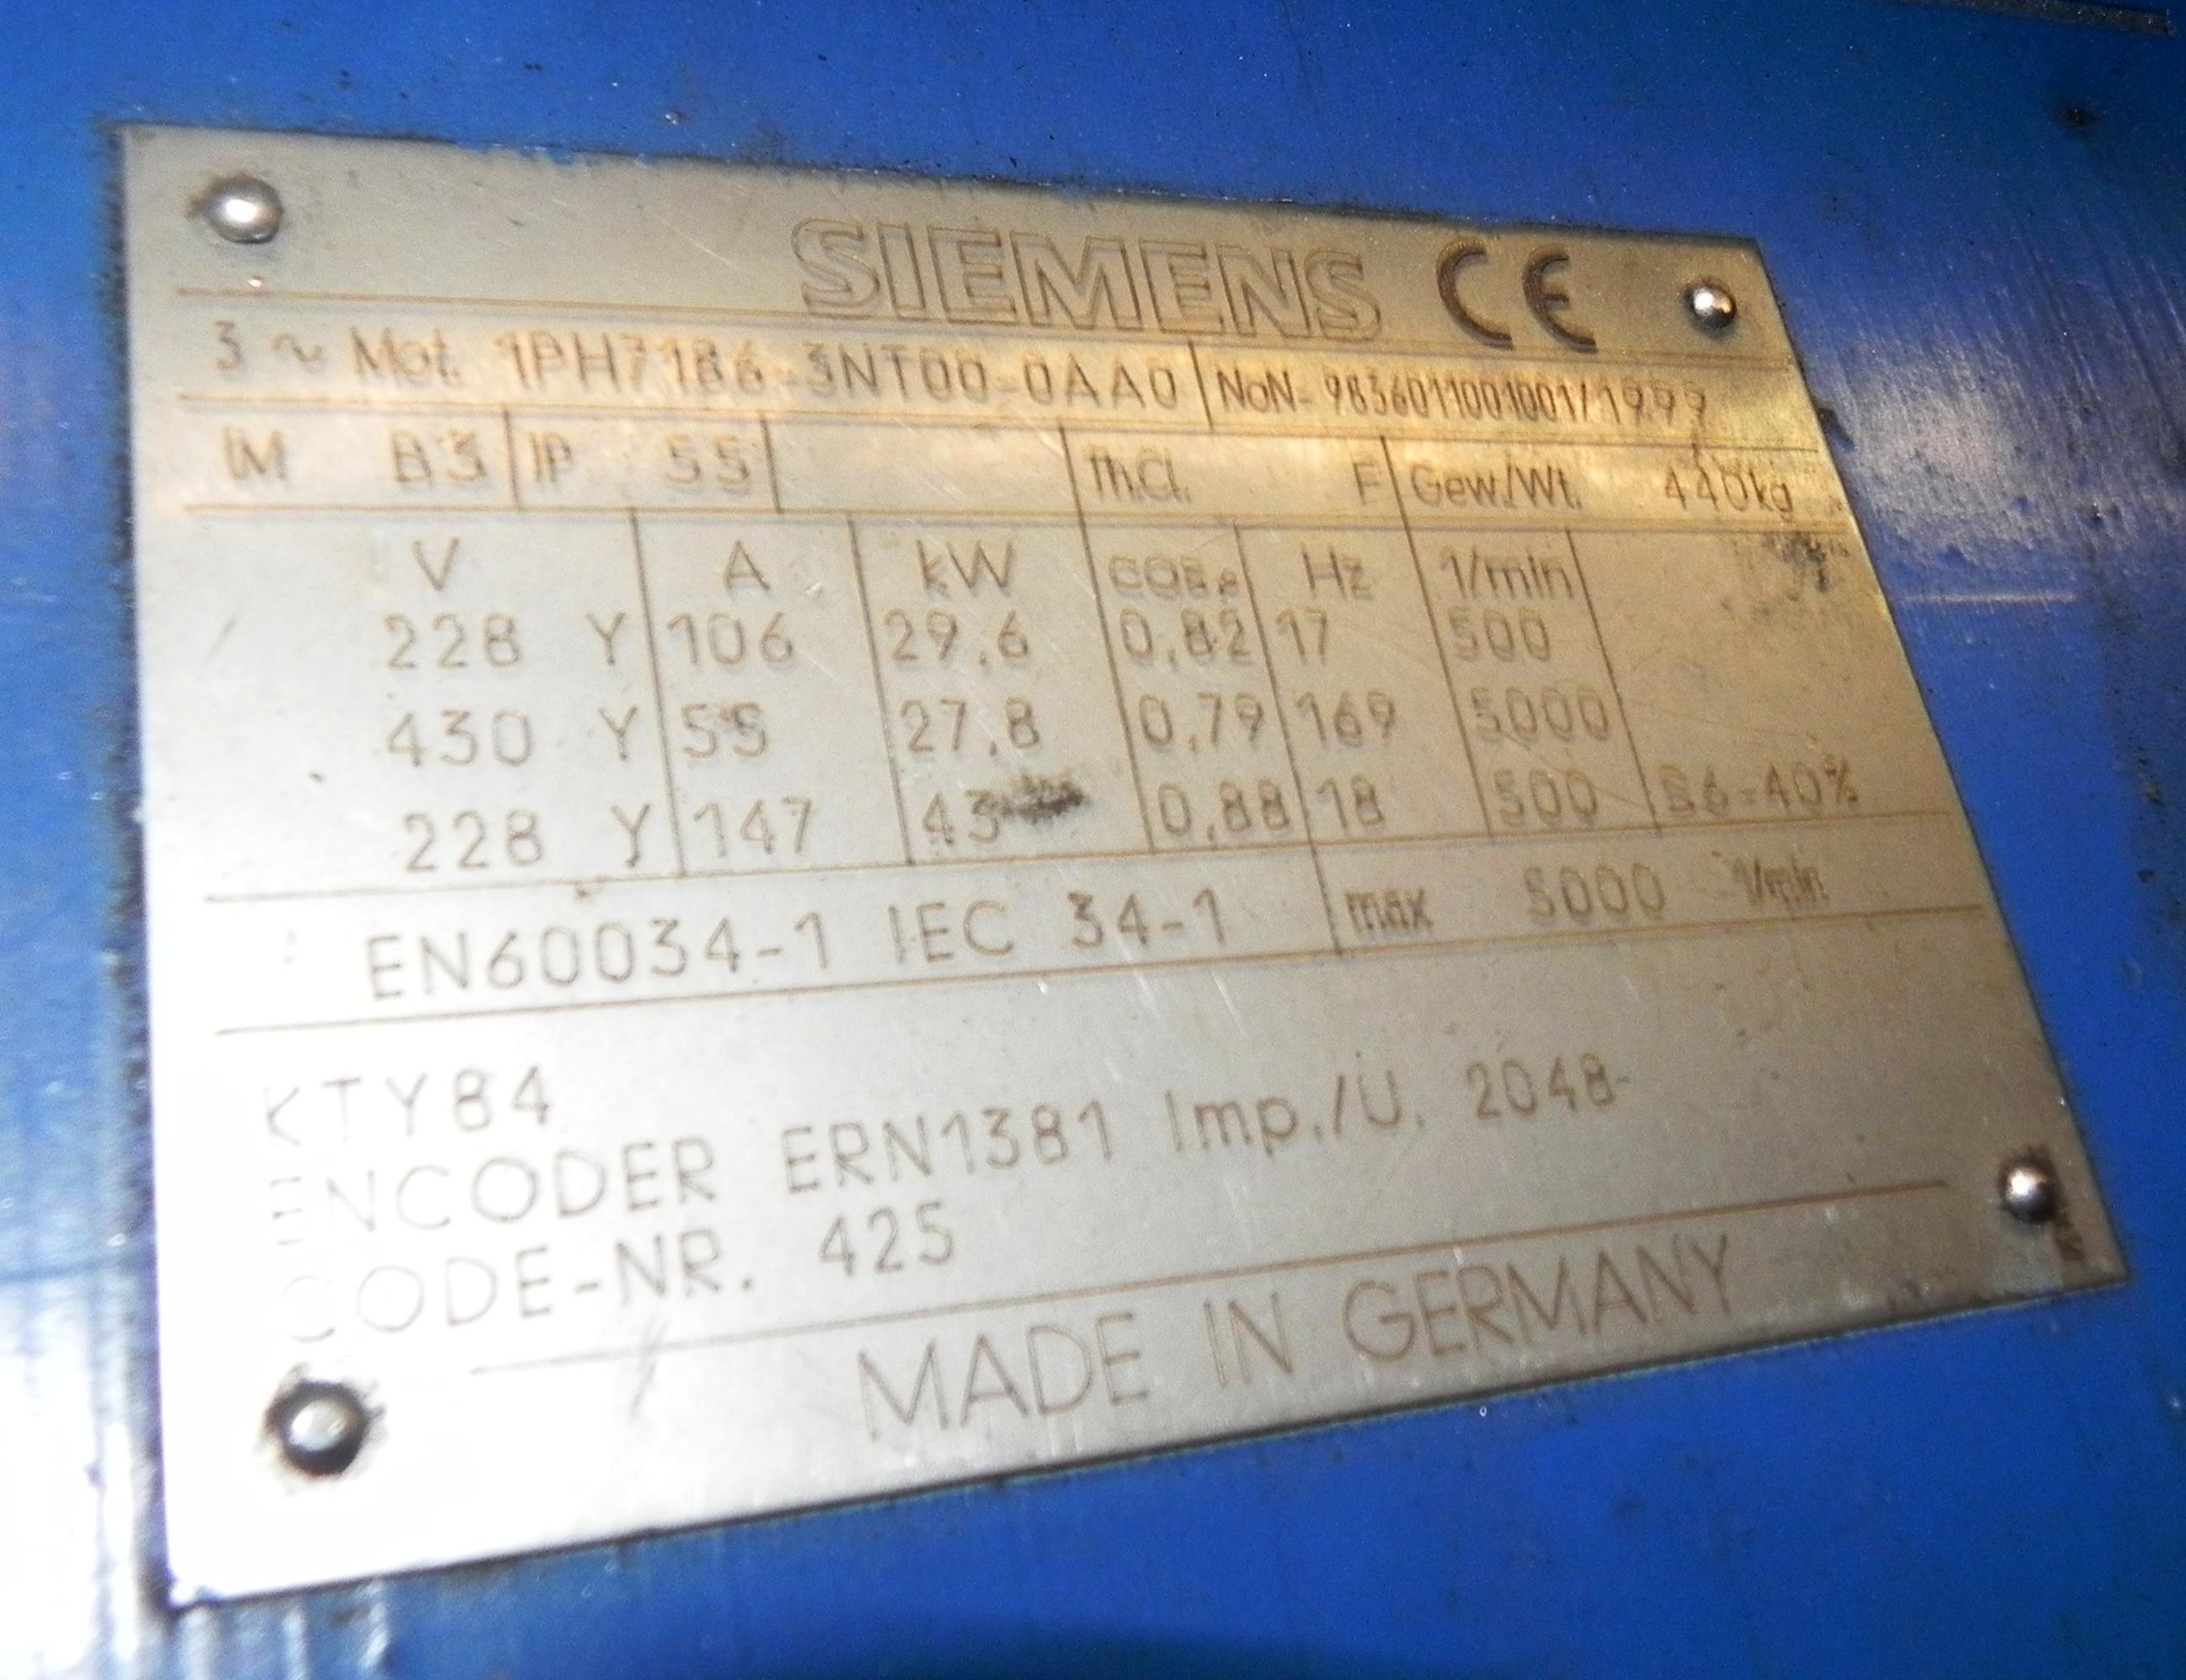 Lot 79 - Siemens 43KW Servo Motor 1PH7186-3NT00-0AA0